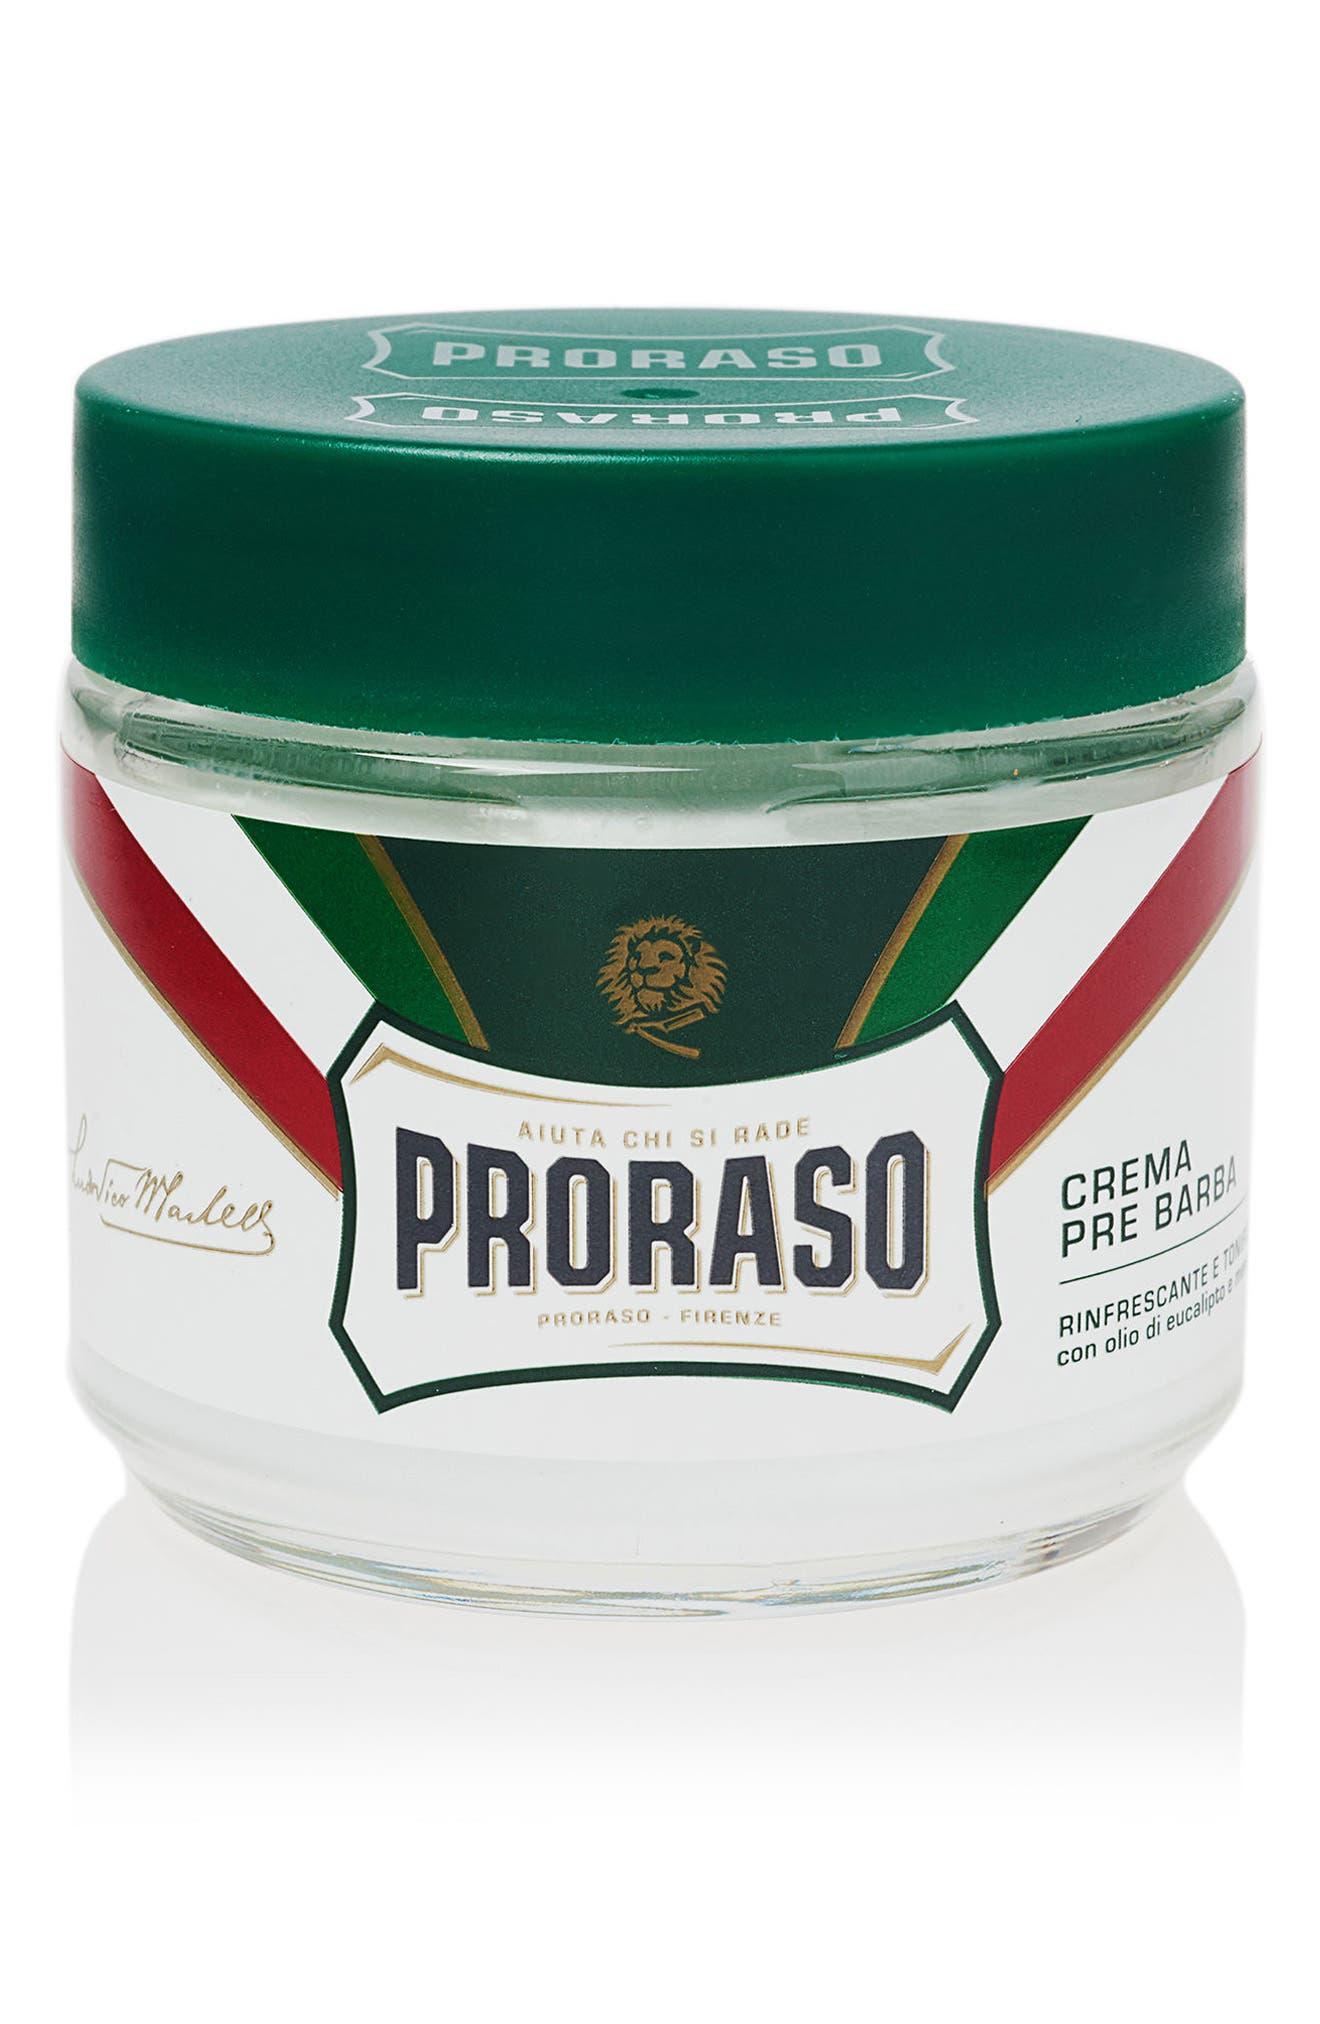 'Proraso' Refresh Pre-Shave Cream,                         Main,                         color, No Color